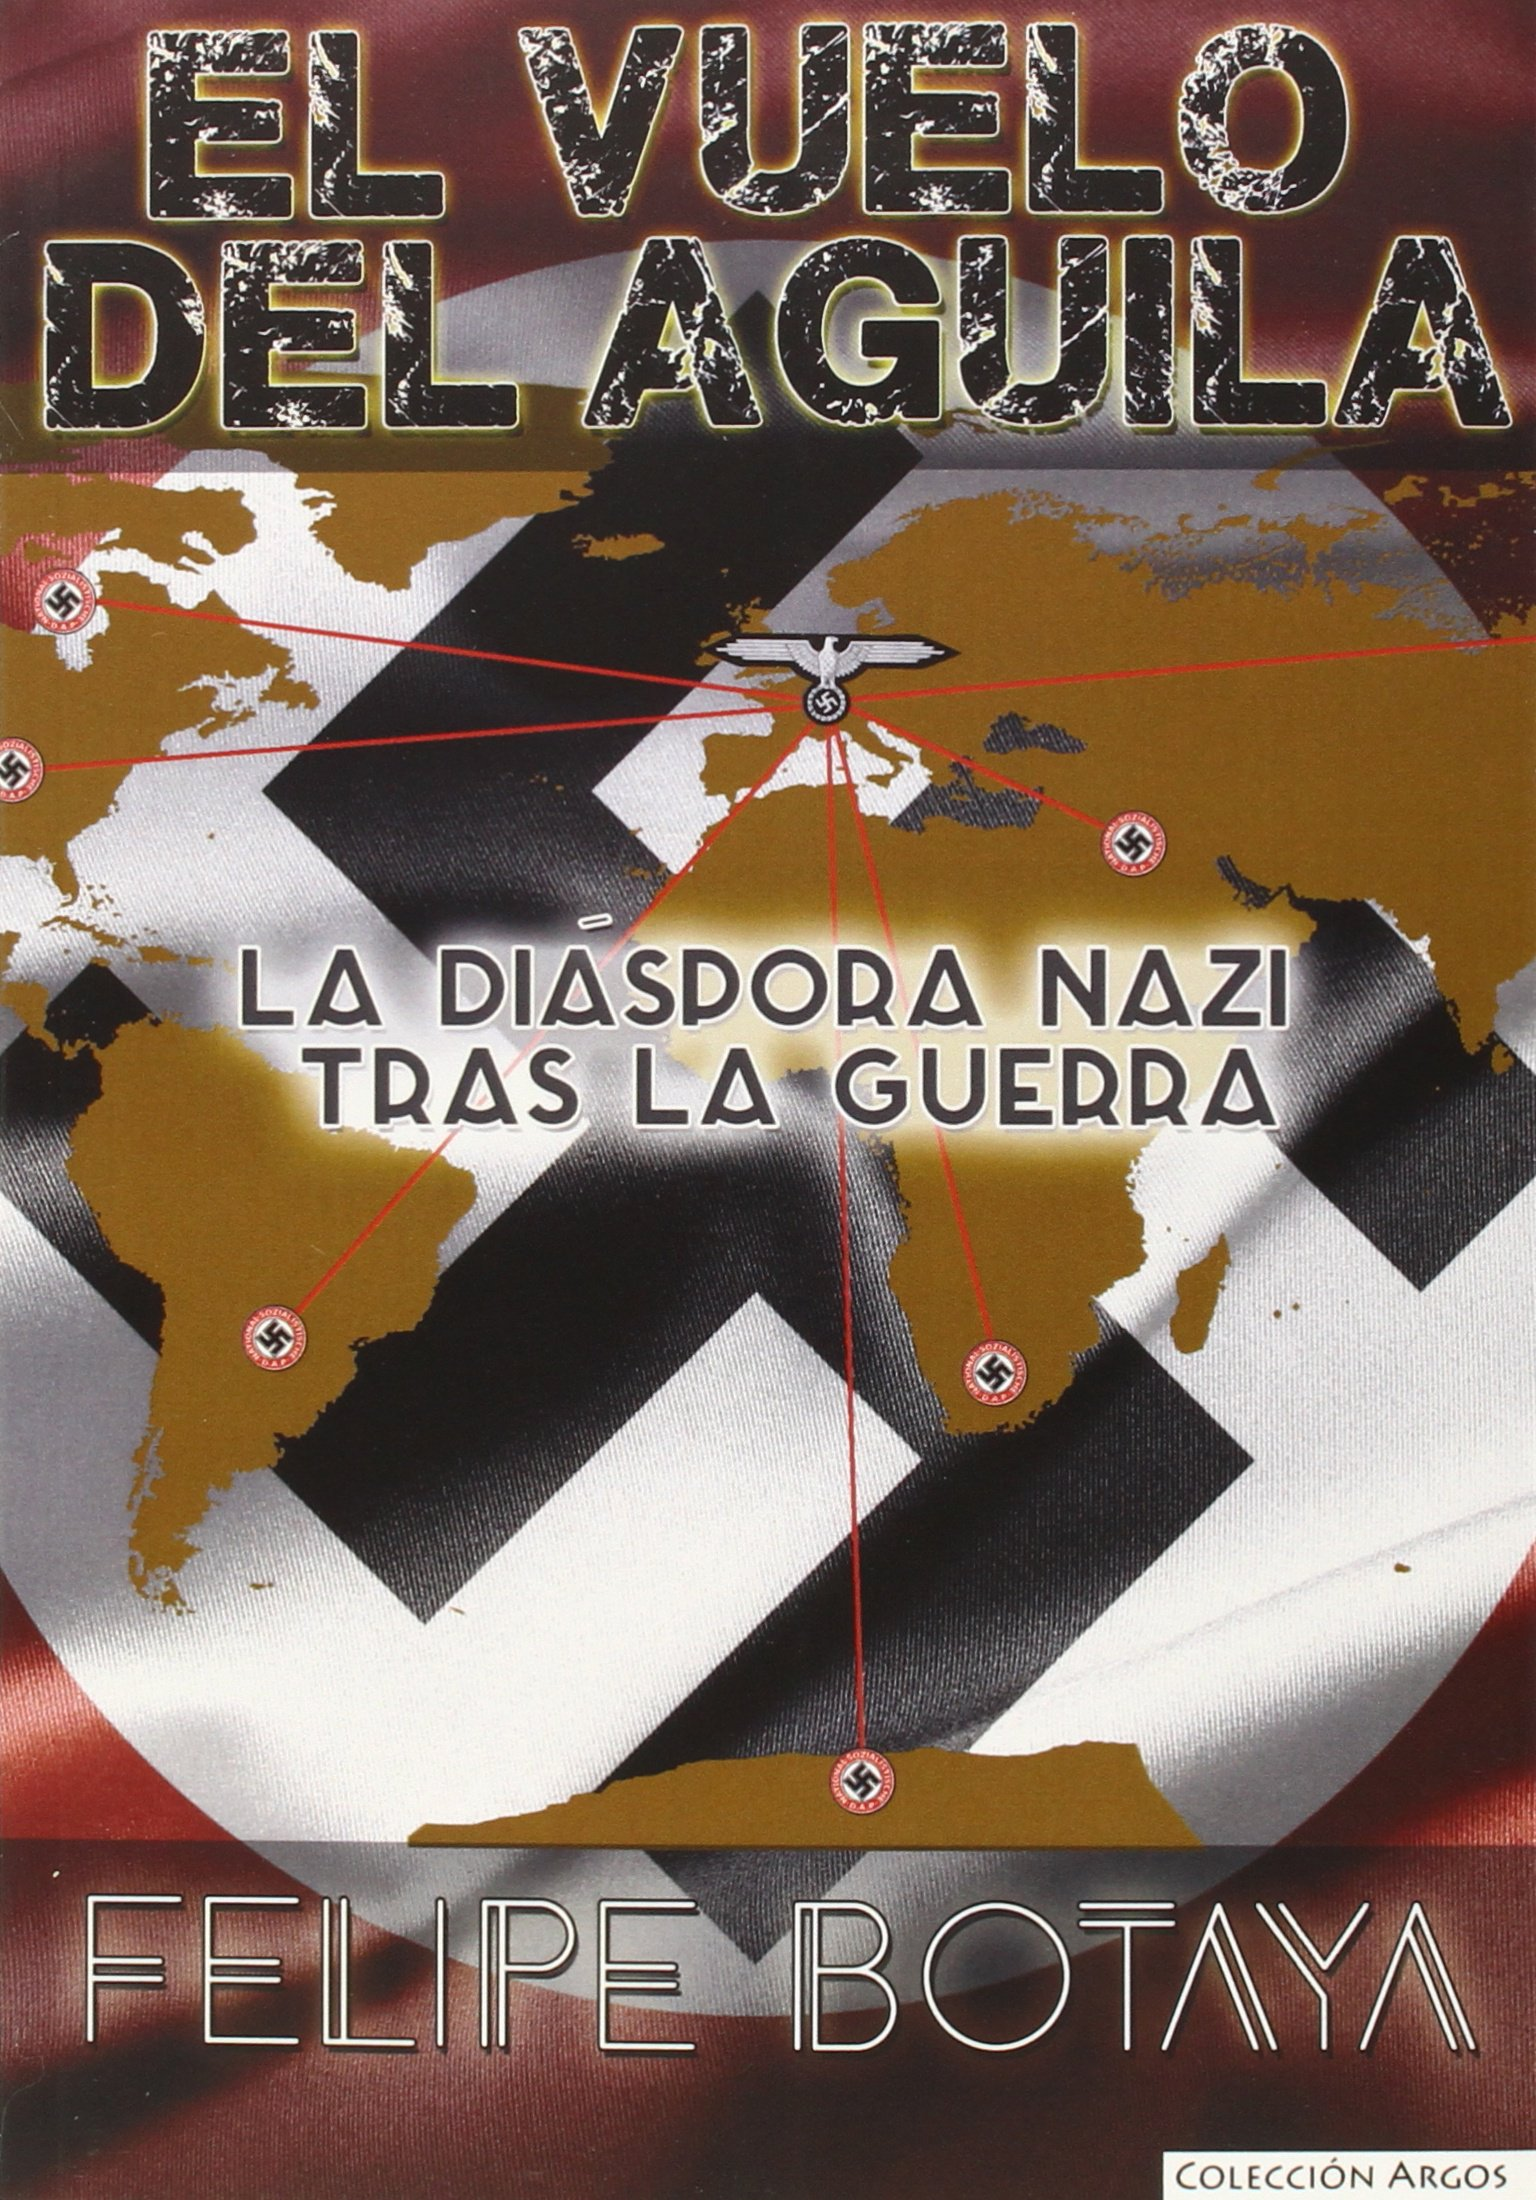 El Vuelo Del Aguila. La Diaspora Nazi (ARGOS) Tapa blanda – 17 jun 2015 FELIPE BOTAYA GARCÍA EAS 8494192477 c 1945 to c 1960